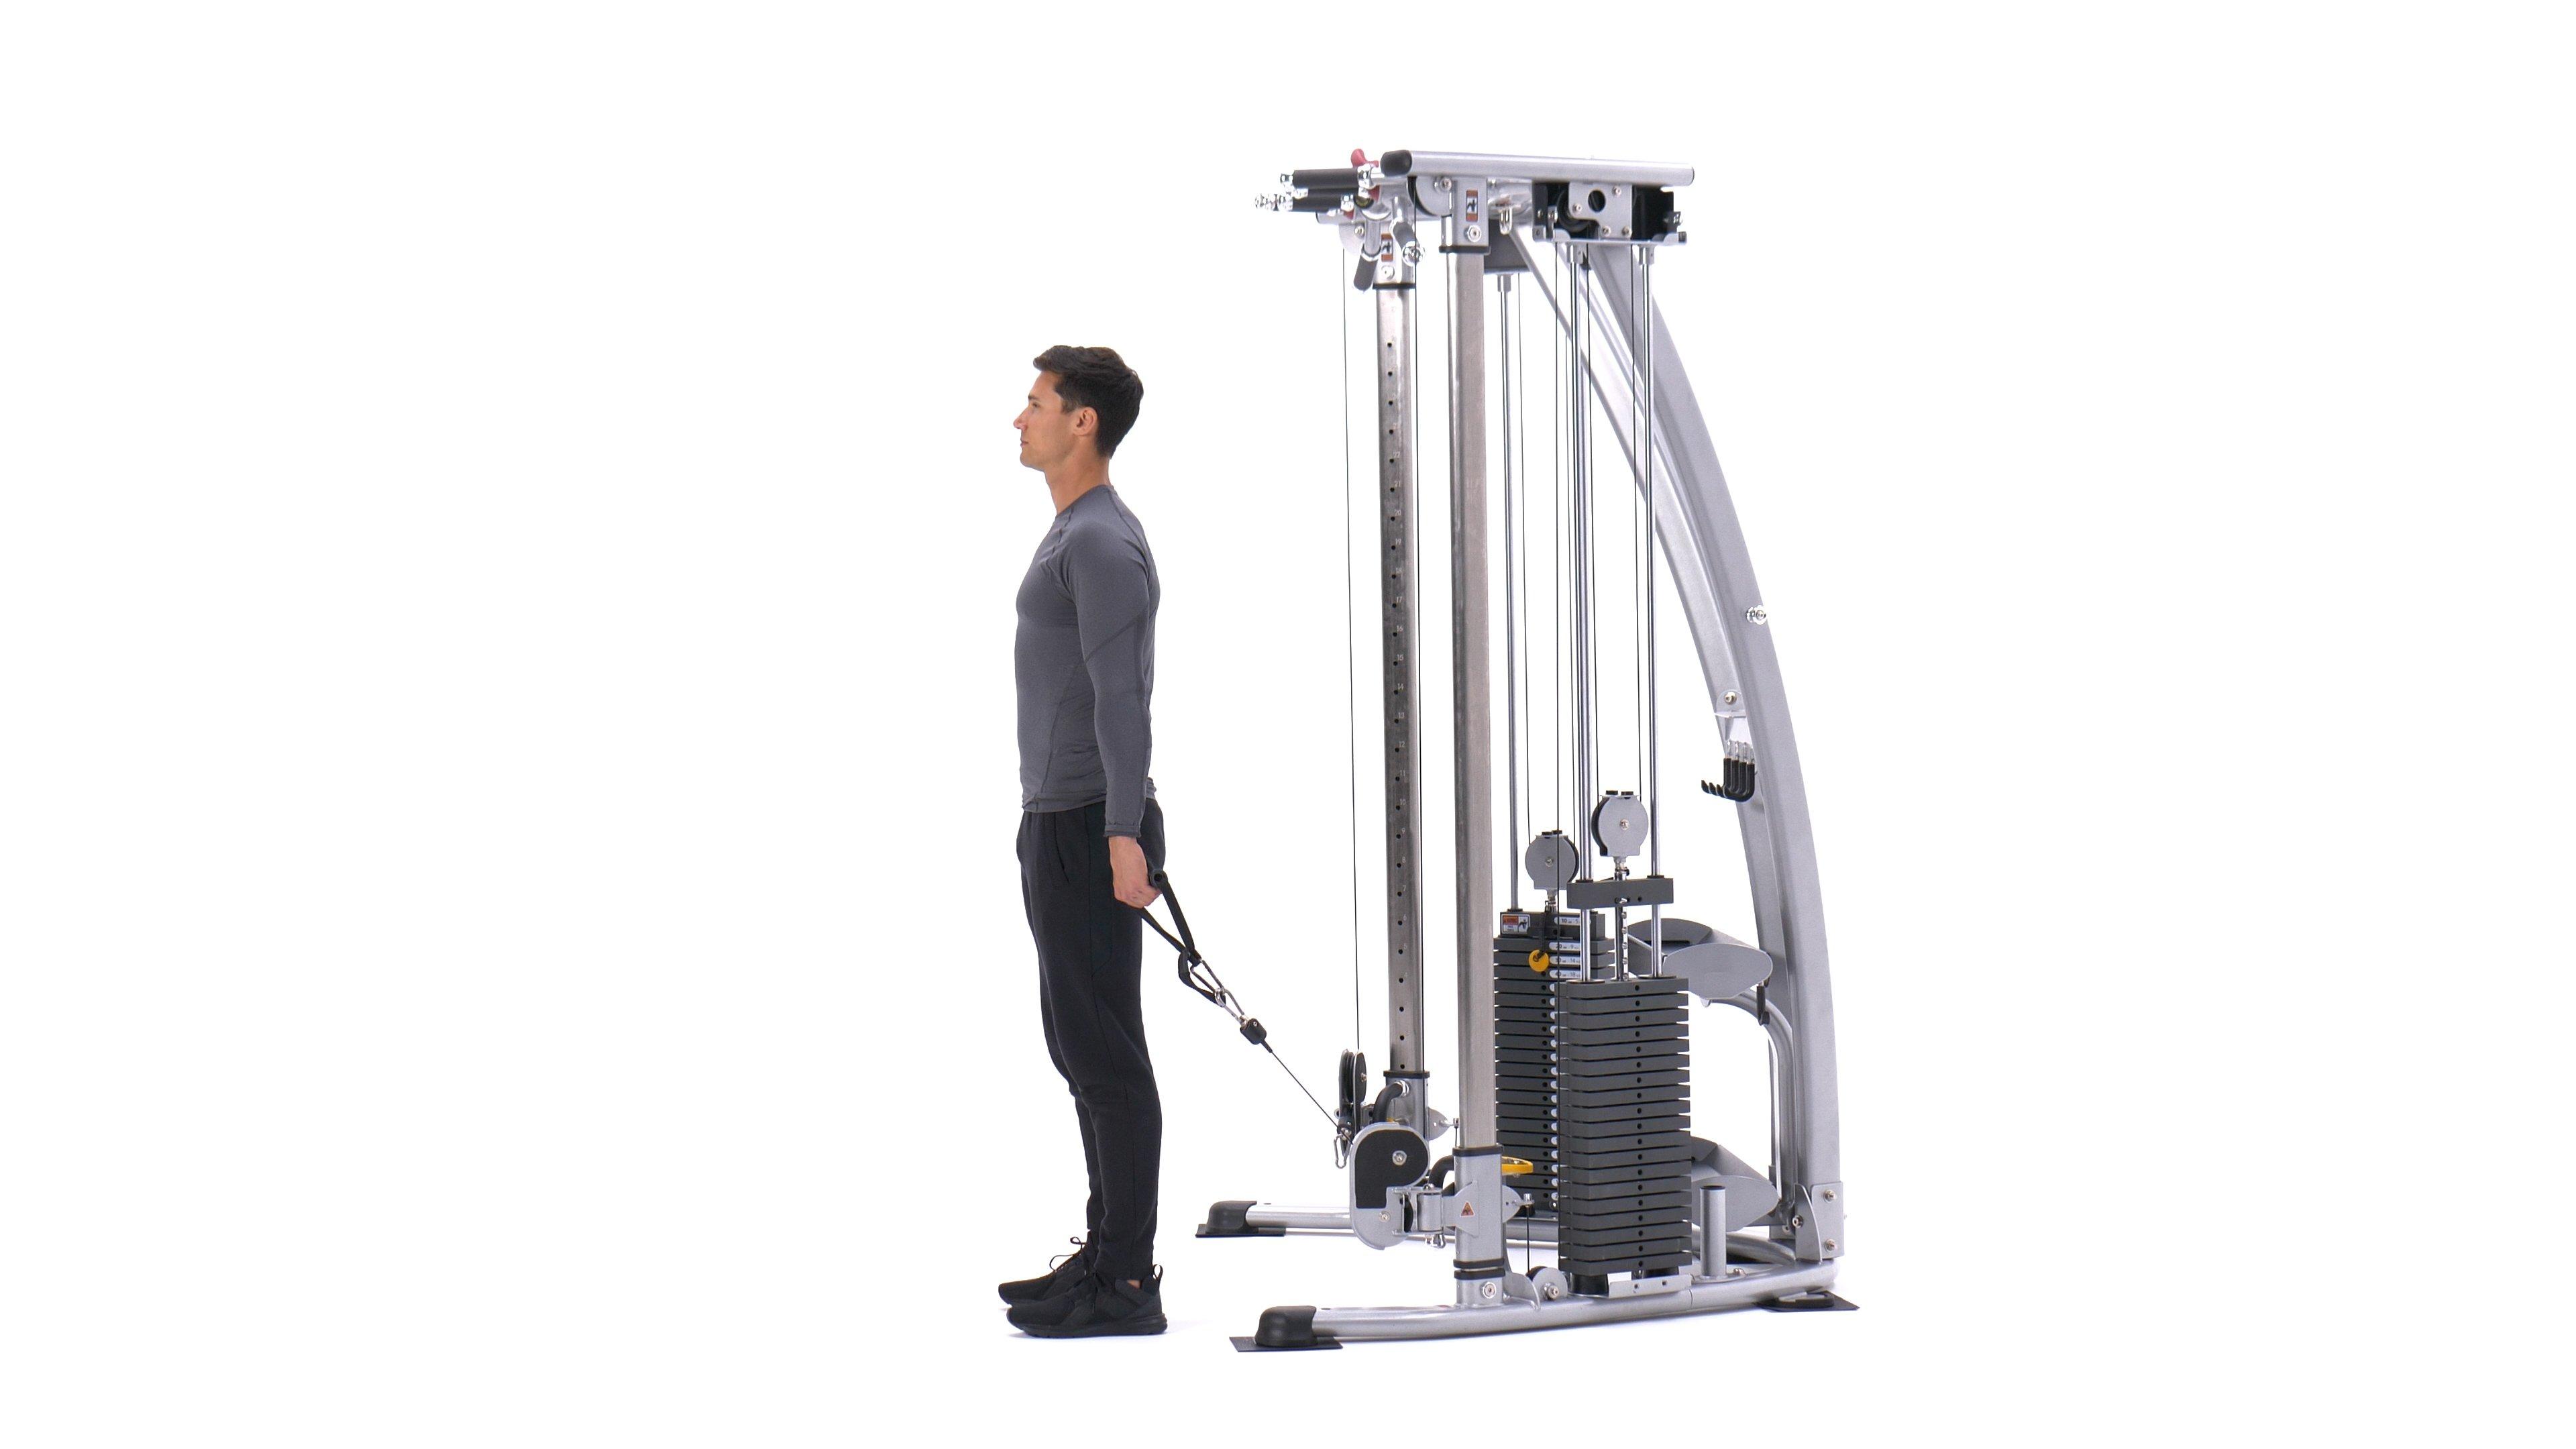 Single-arm cable front raise image